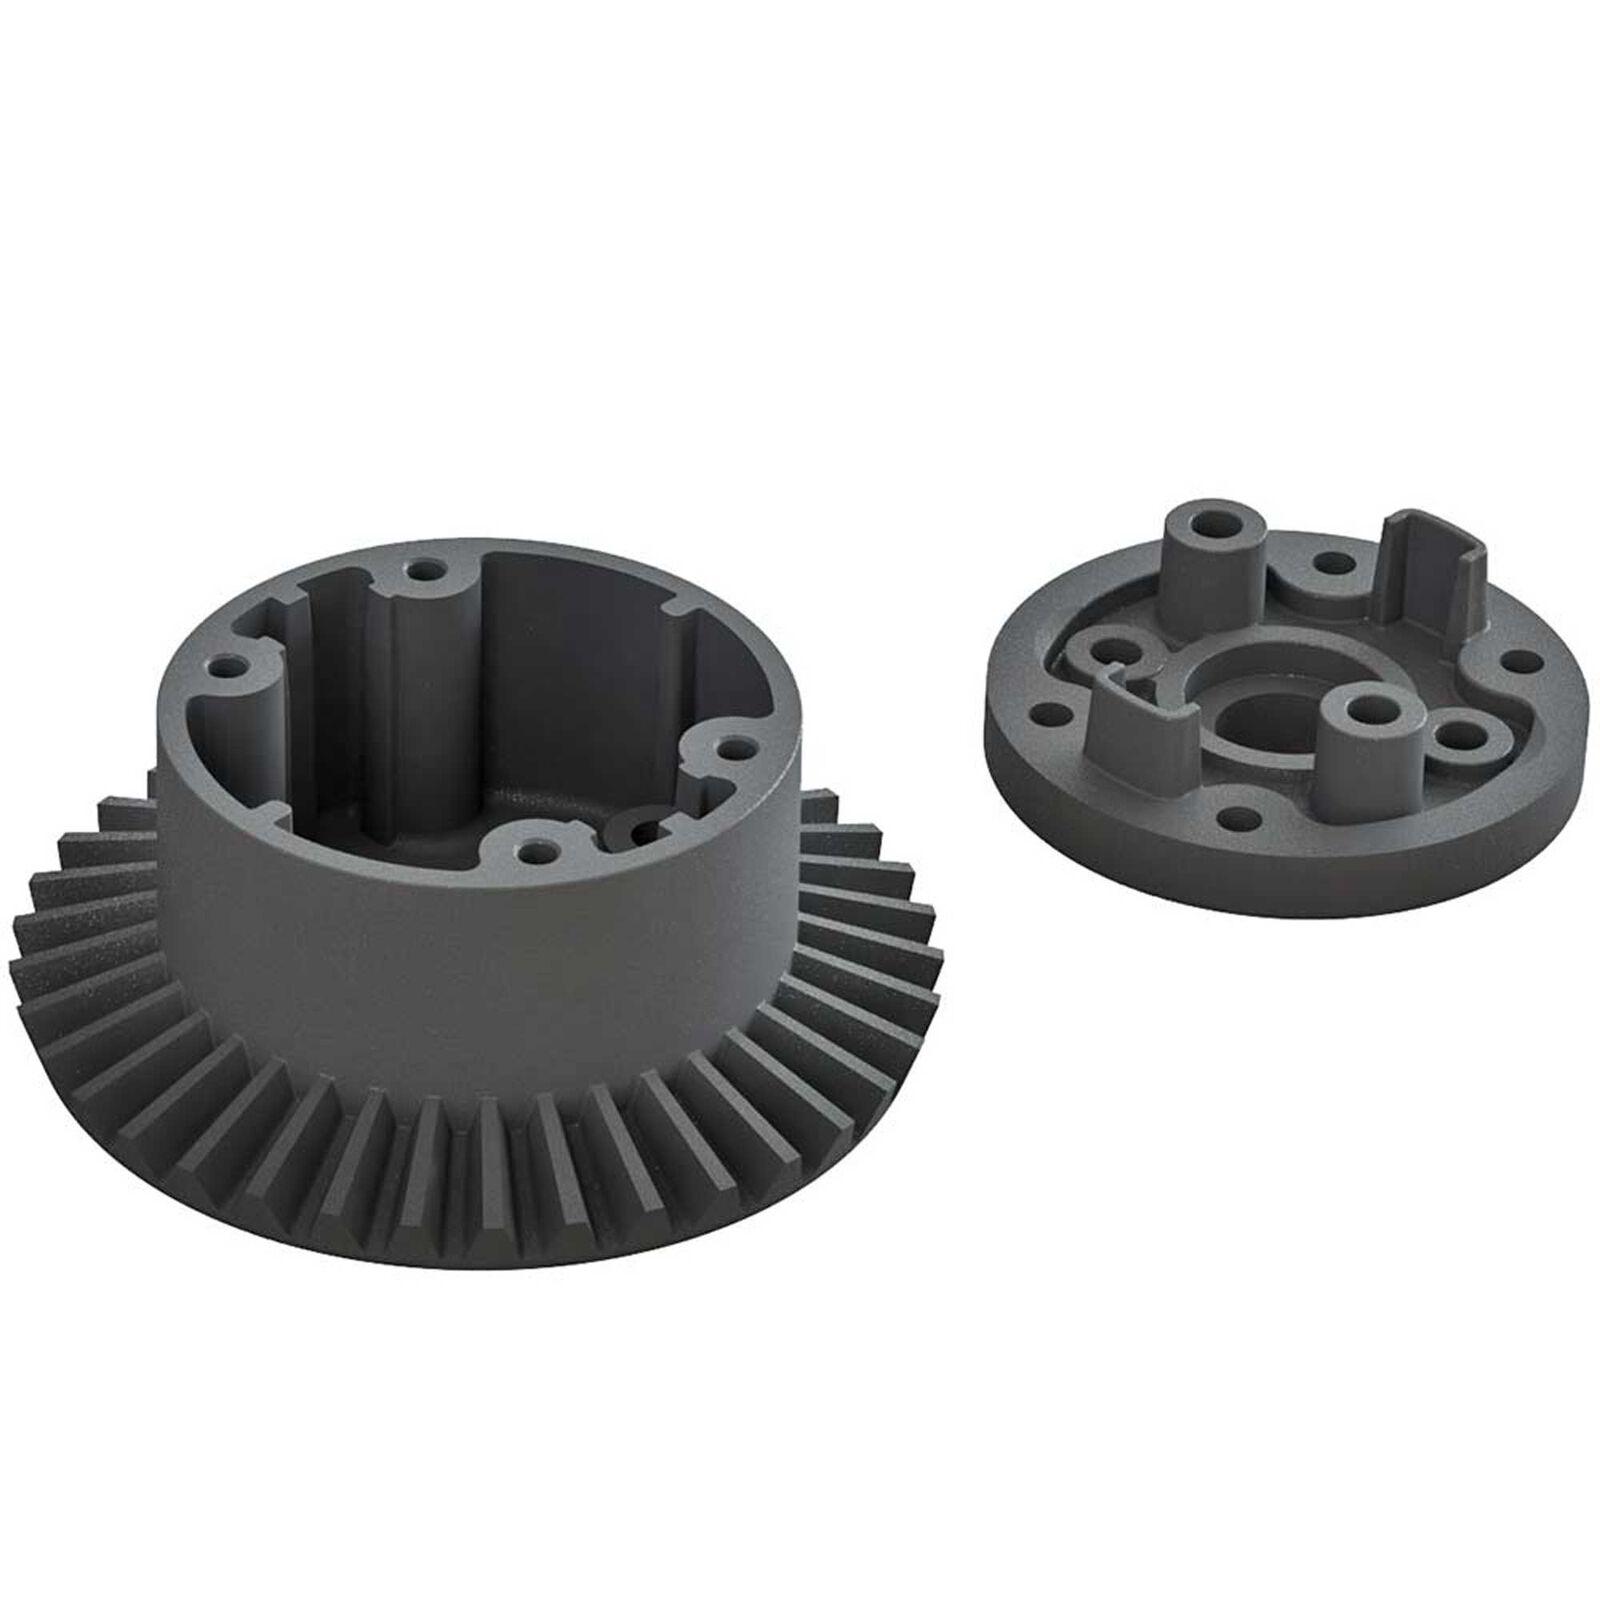 Differential Case Set 37T Main Gear: BLX 3S